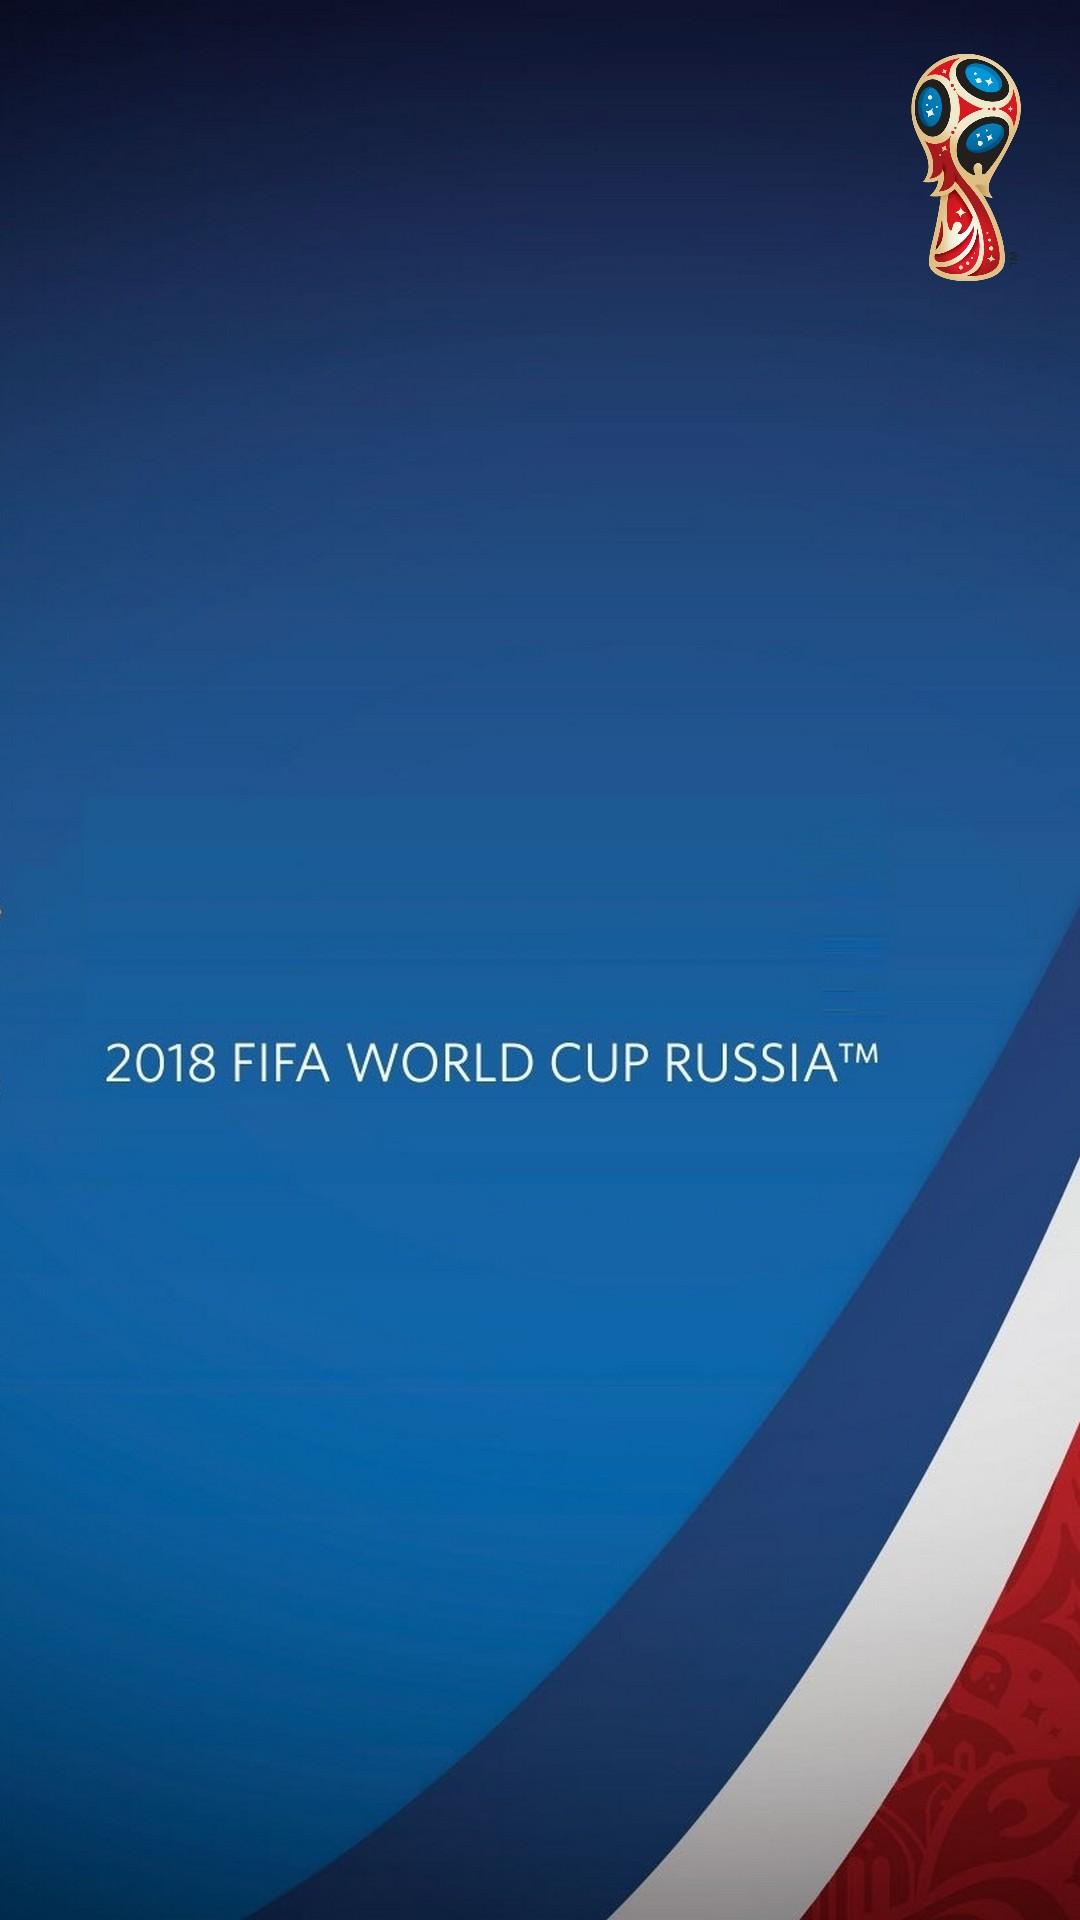 2018 world cup hd